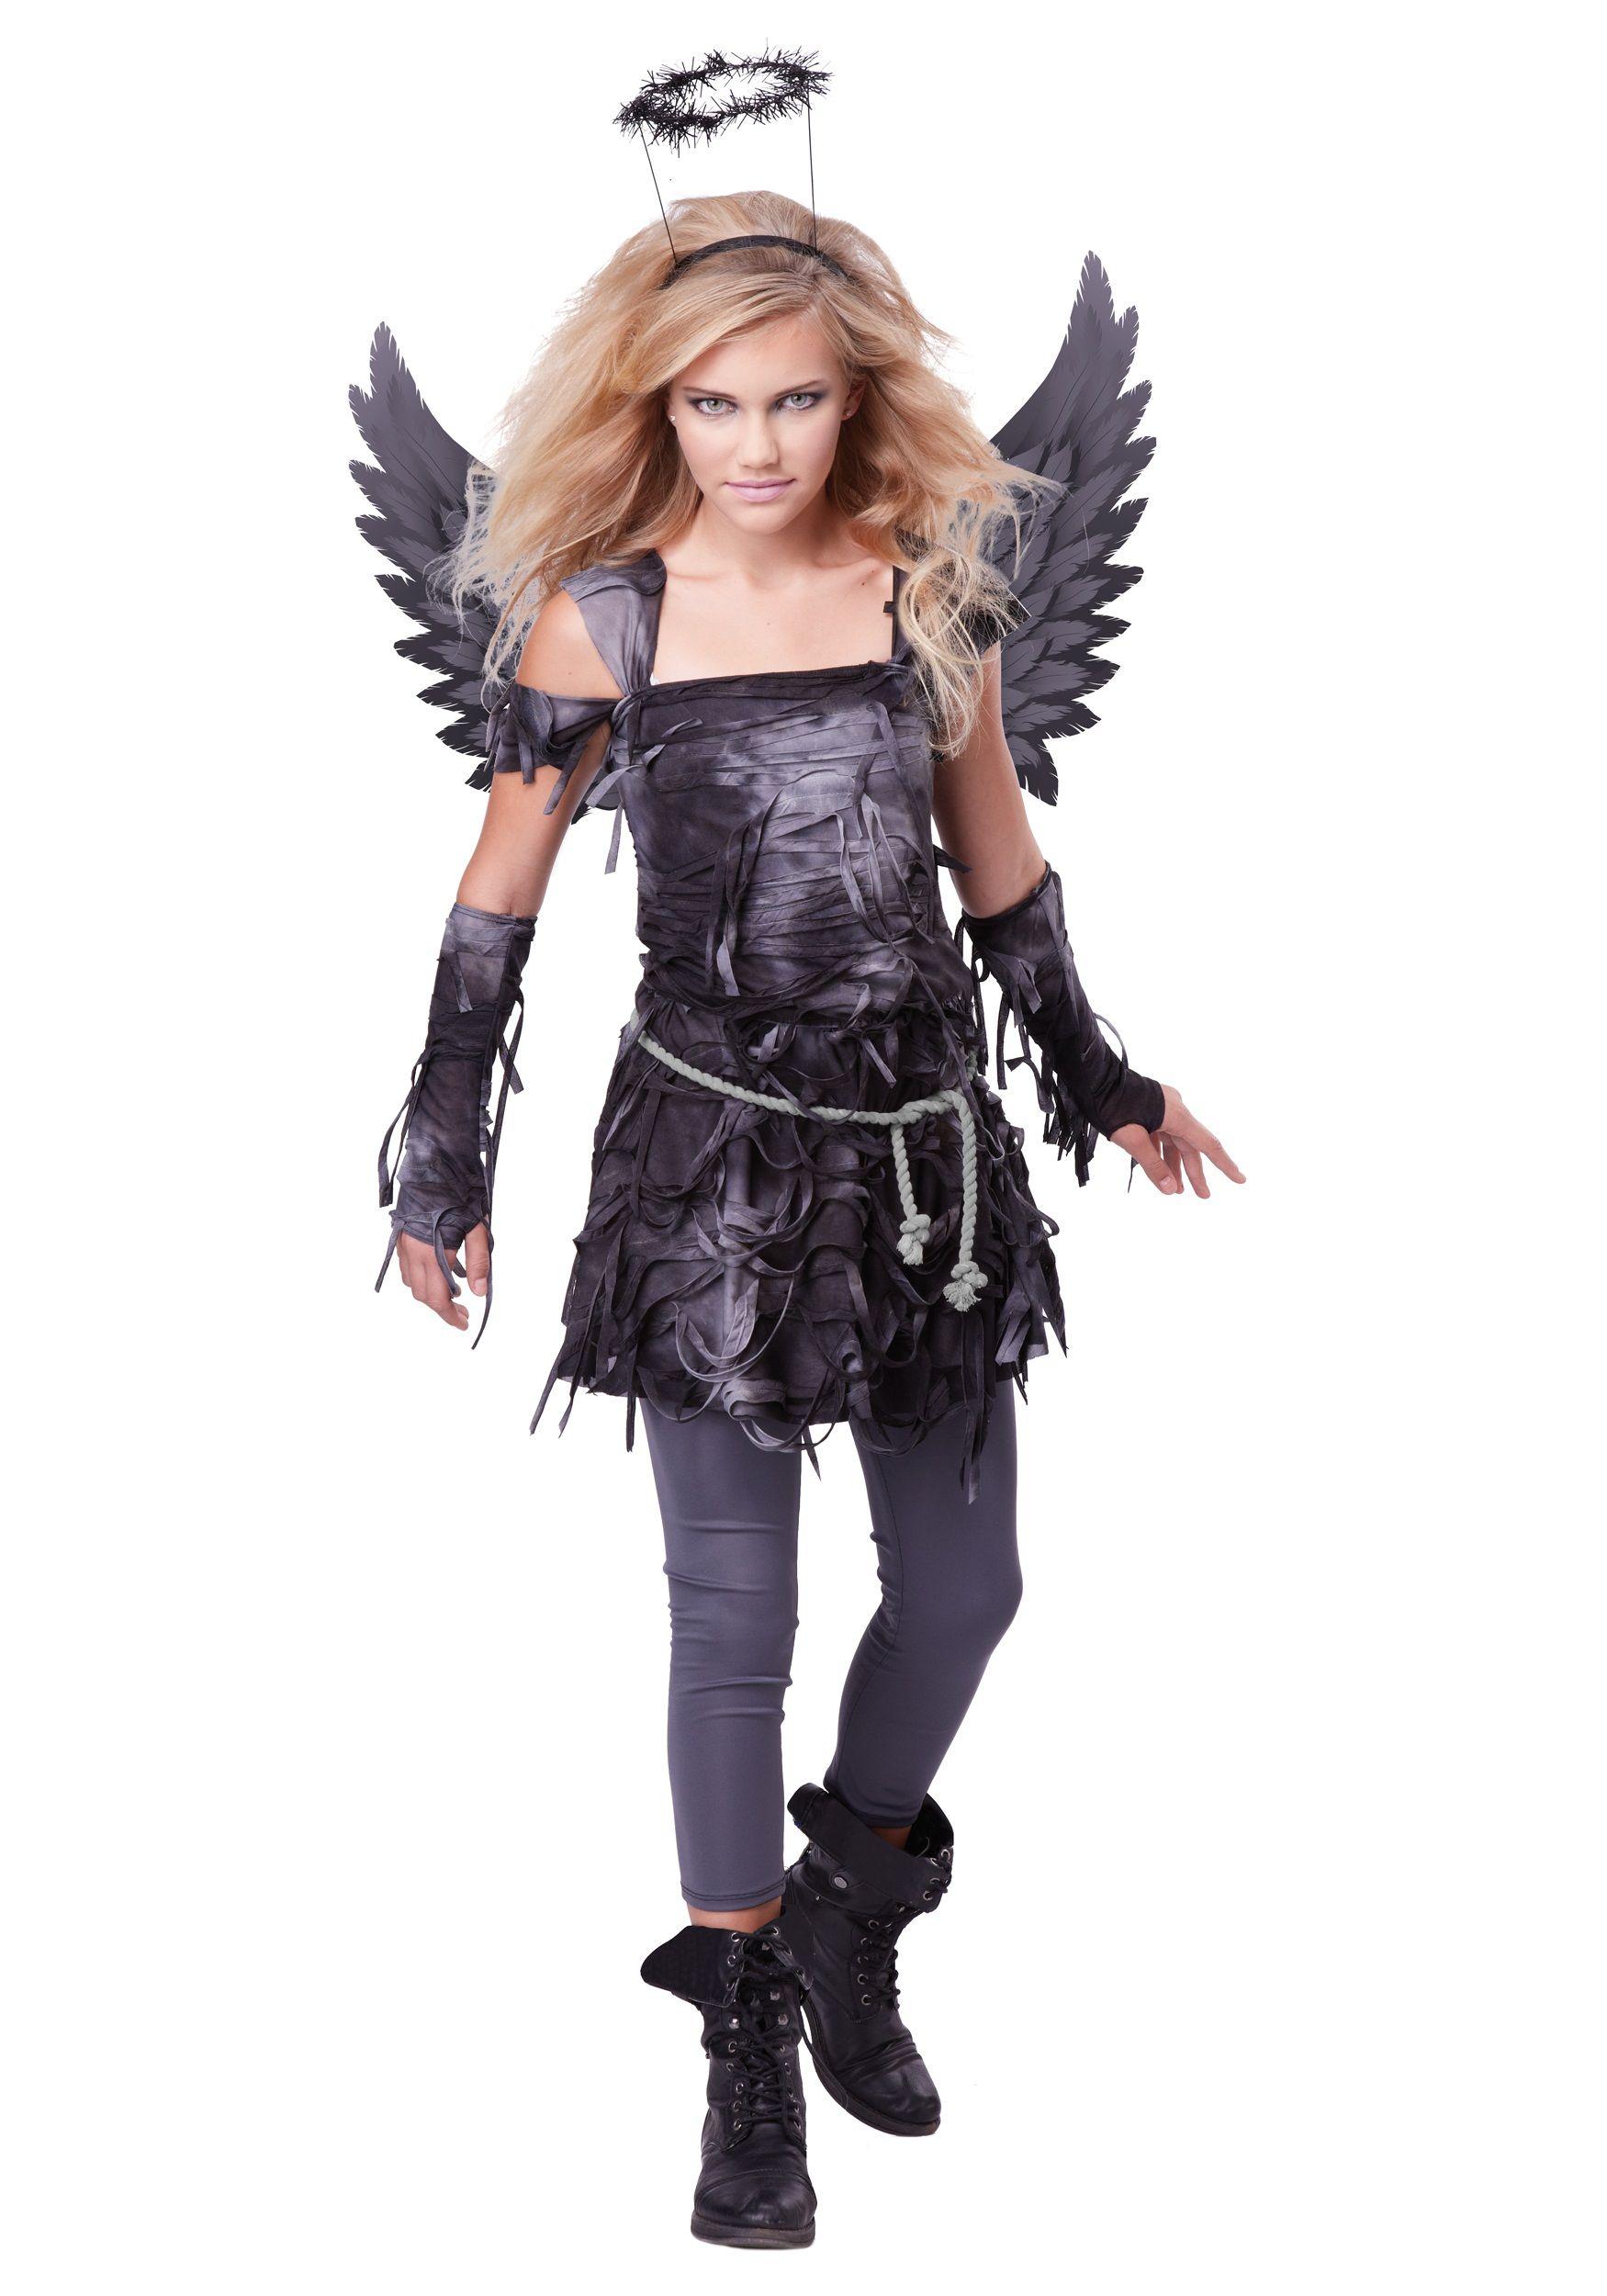 Spooky Angel Costume   Halloween costumes   Pinterest   Costumes ...